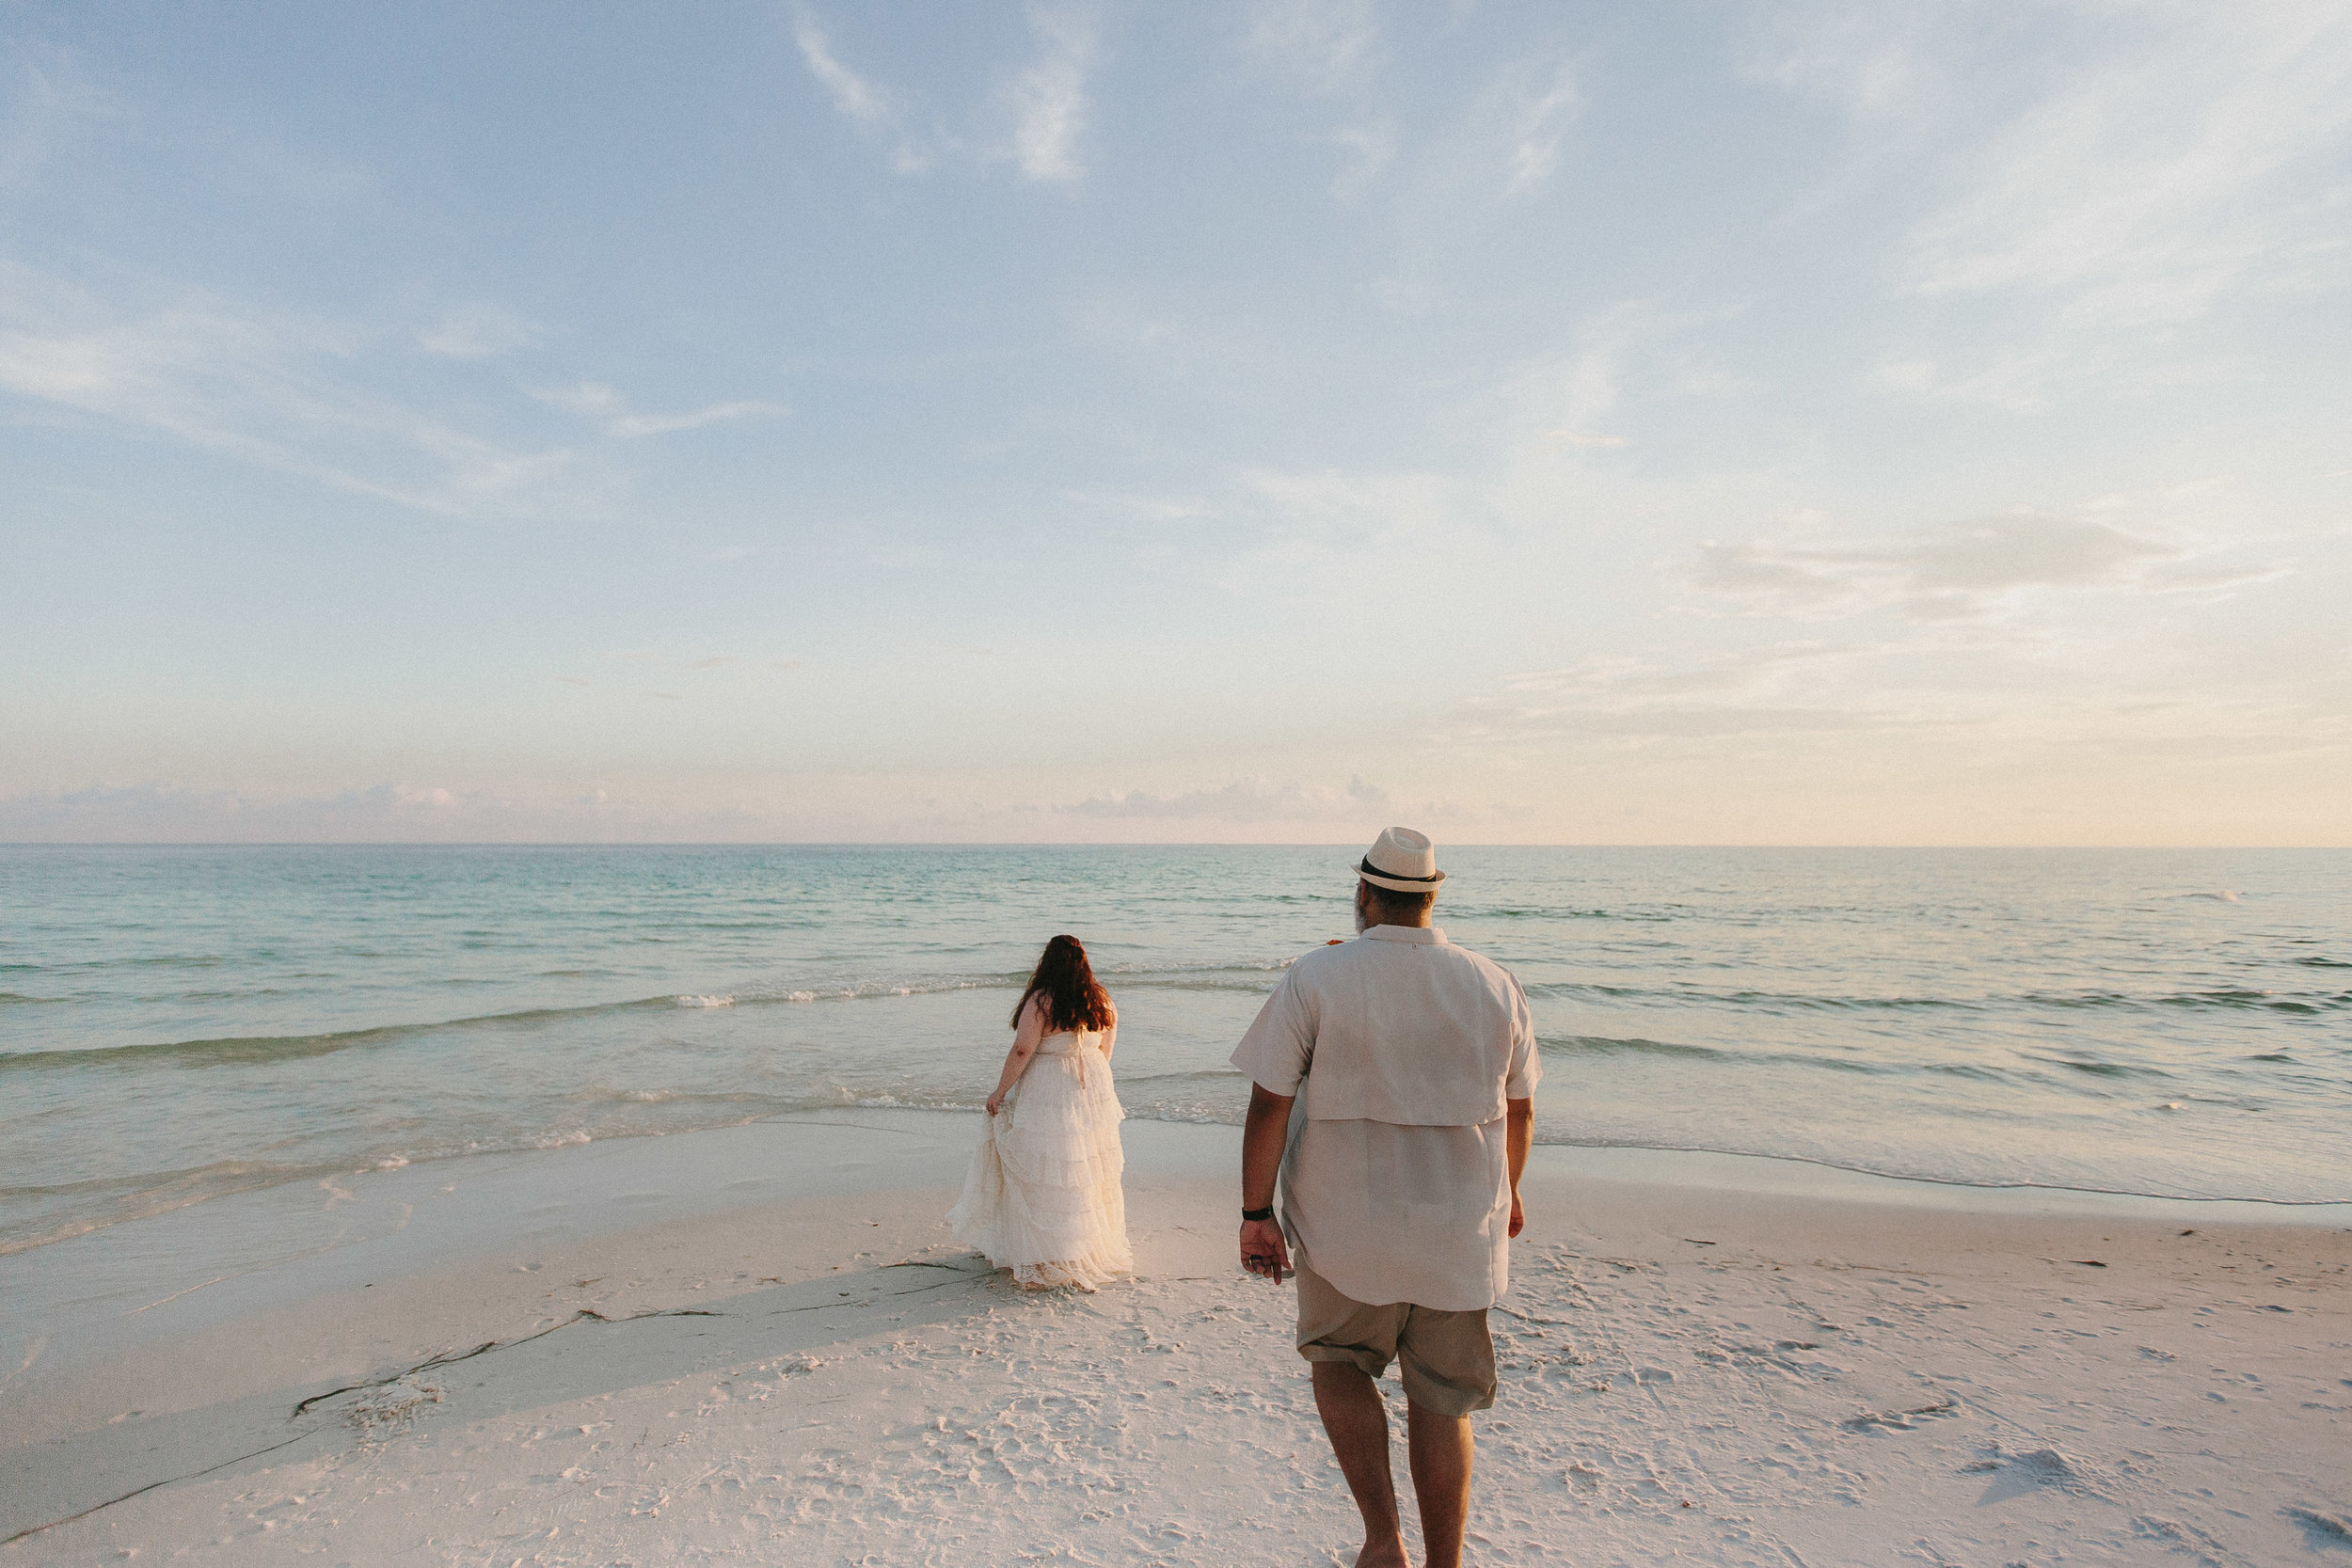 destin_sunset_beach_elopement_intimate_wedding_photographer_florida_documentary_1260.jpg